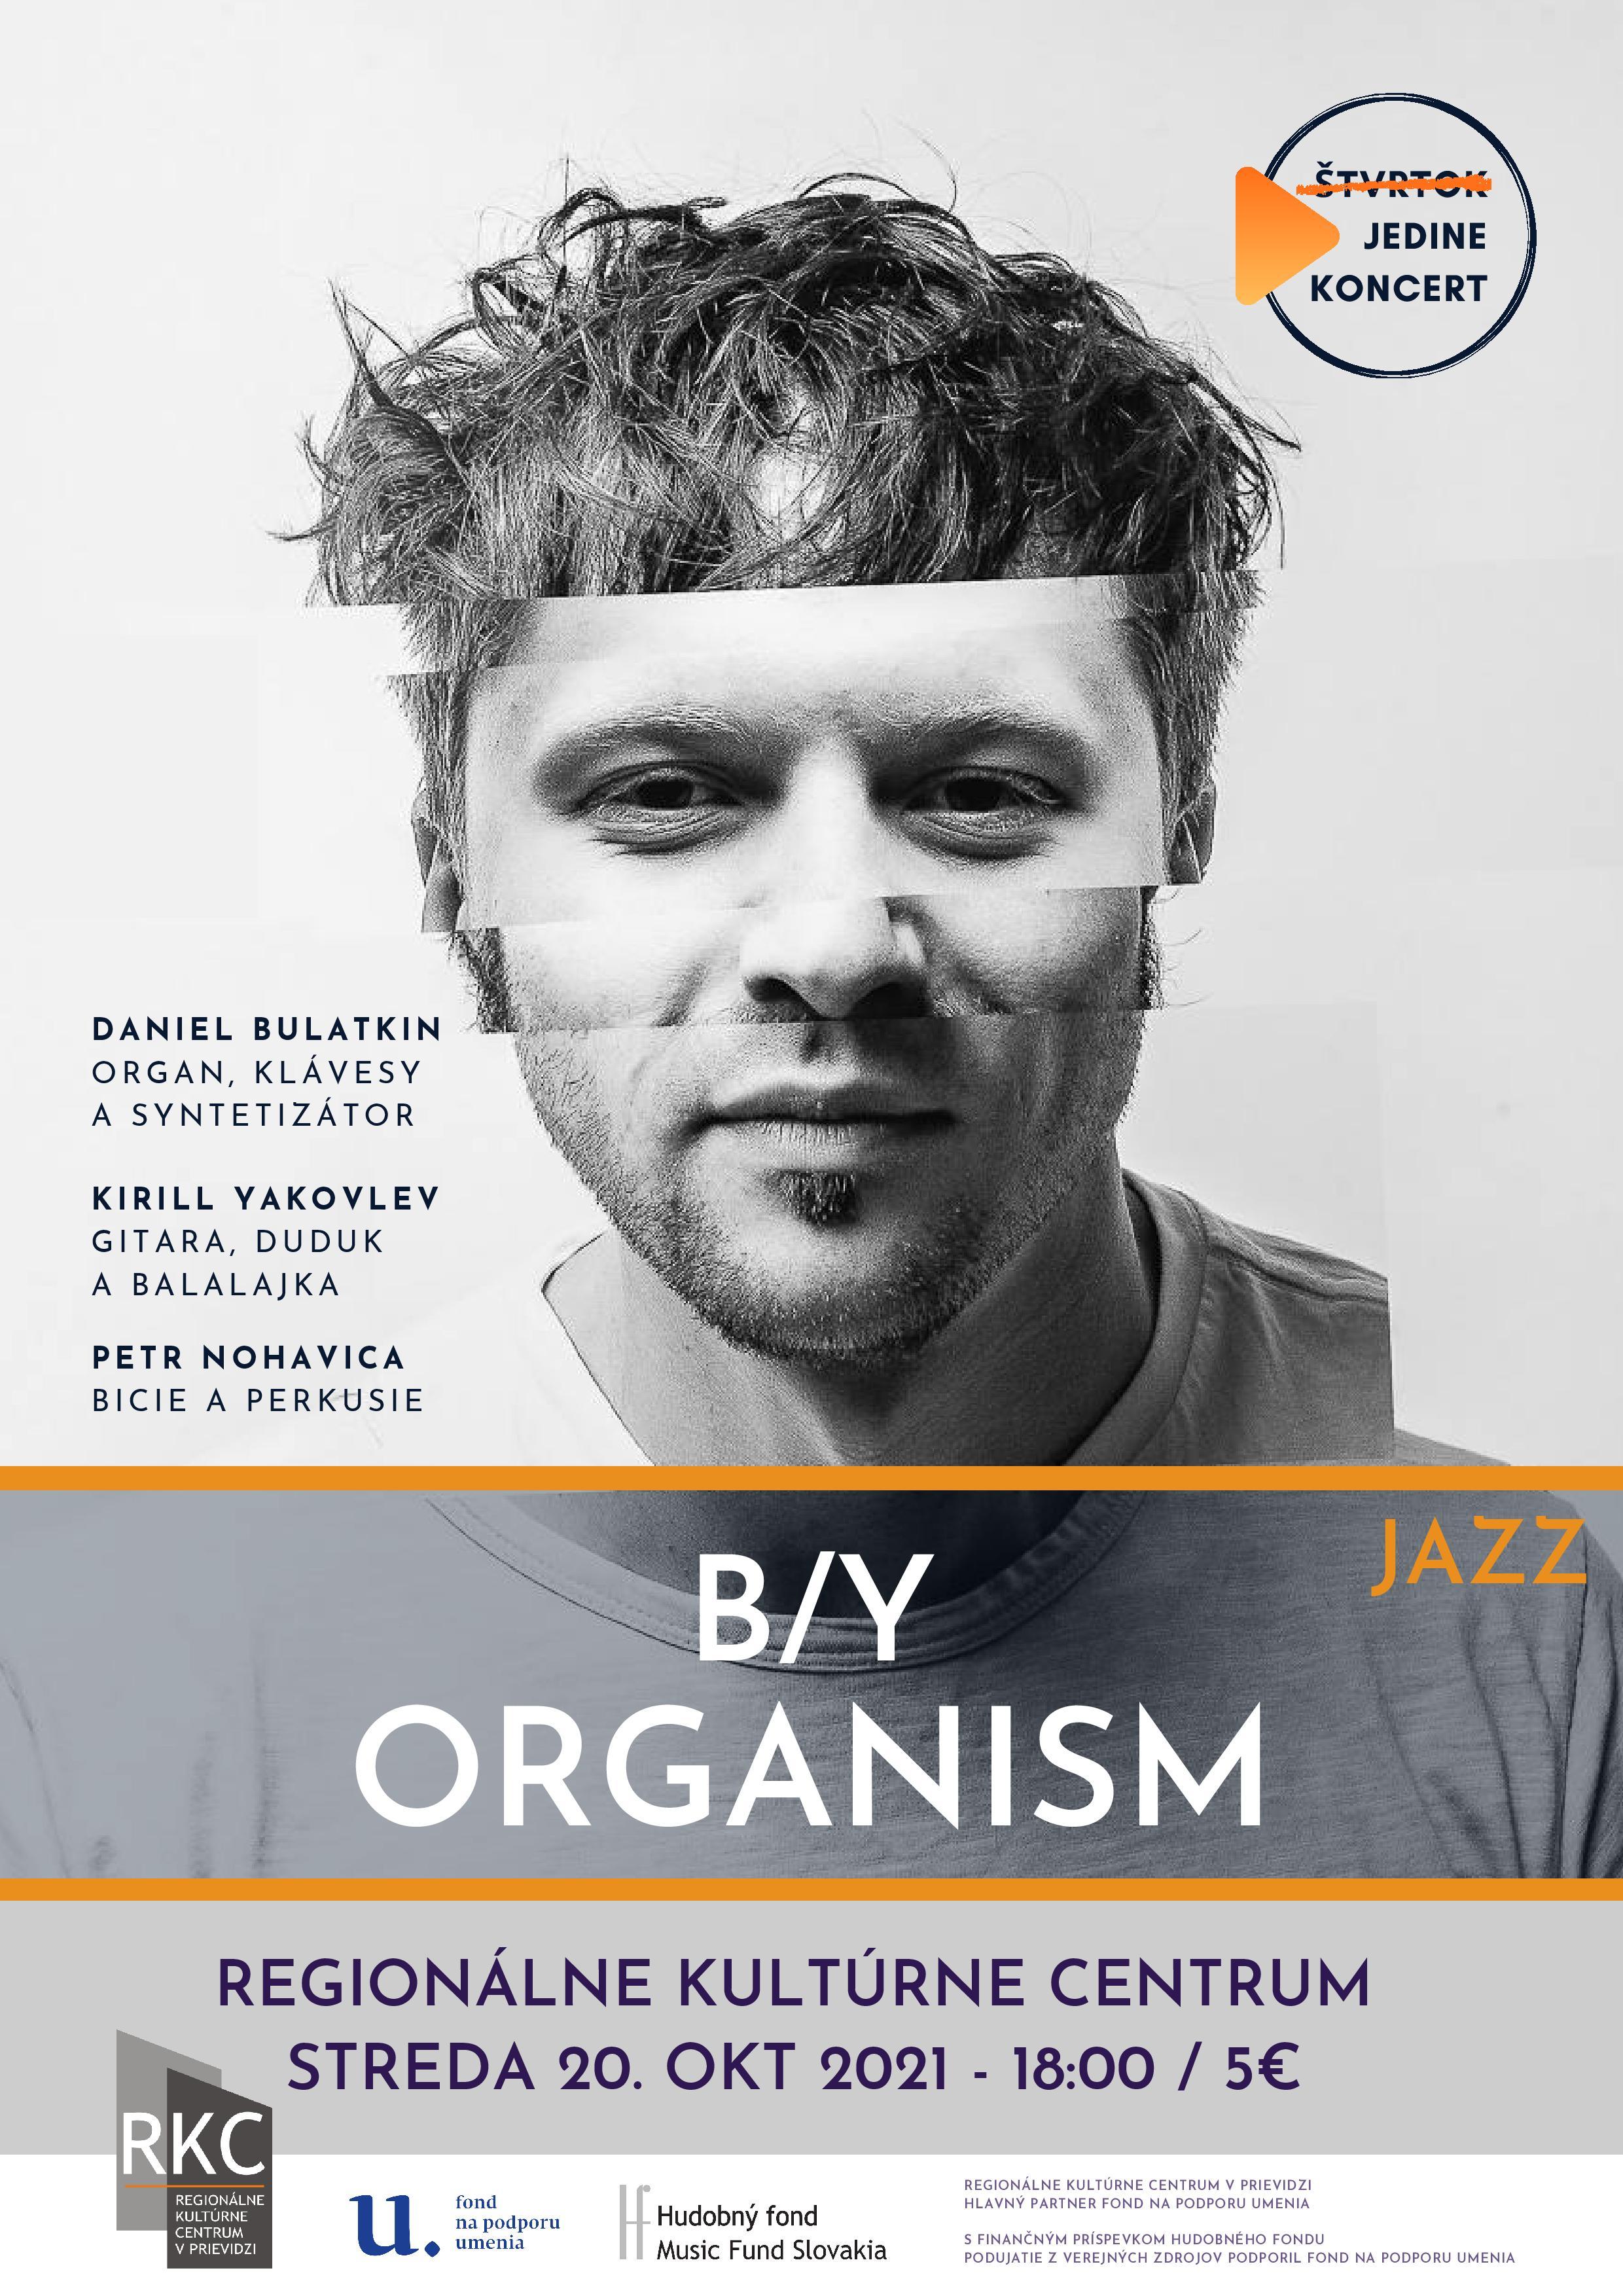 Jedine koncert! B/Y Organism